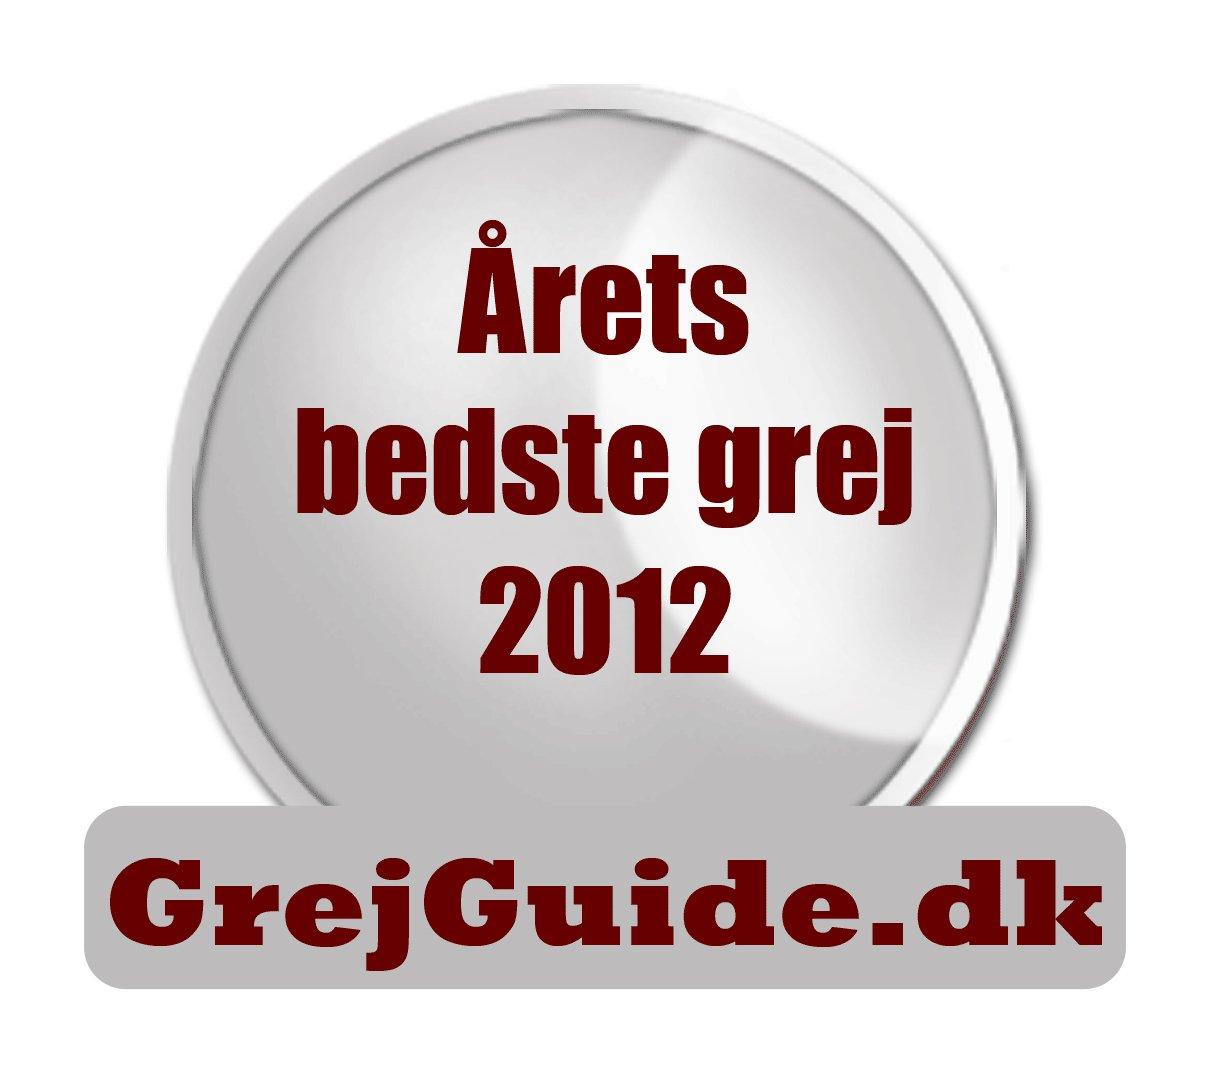 Årets bedste grej 2012